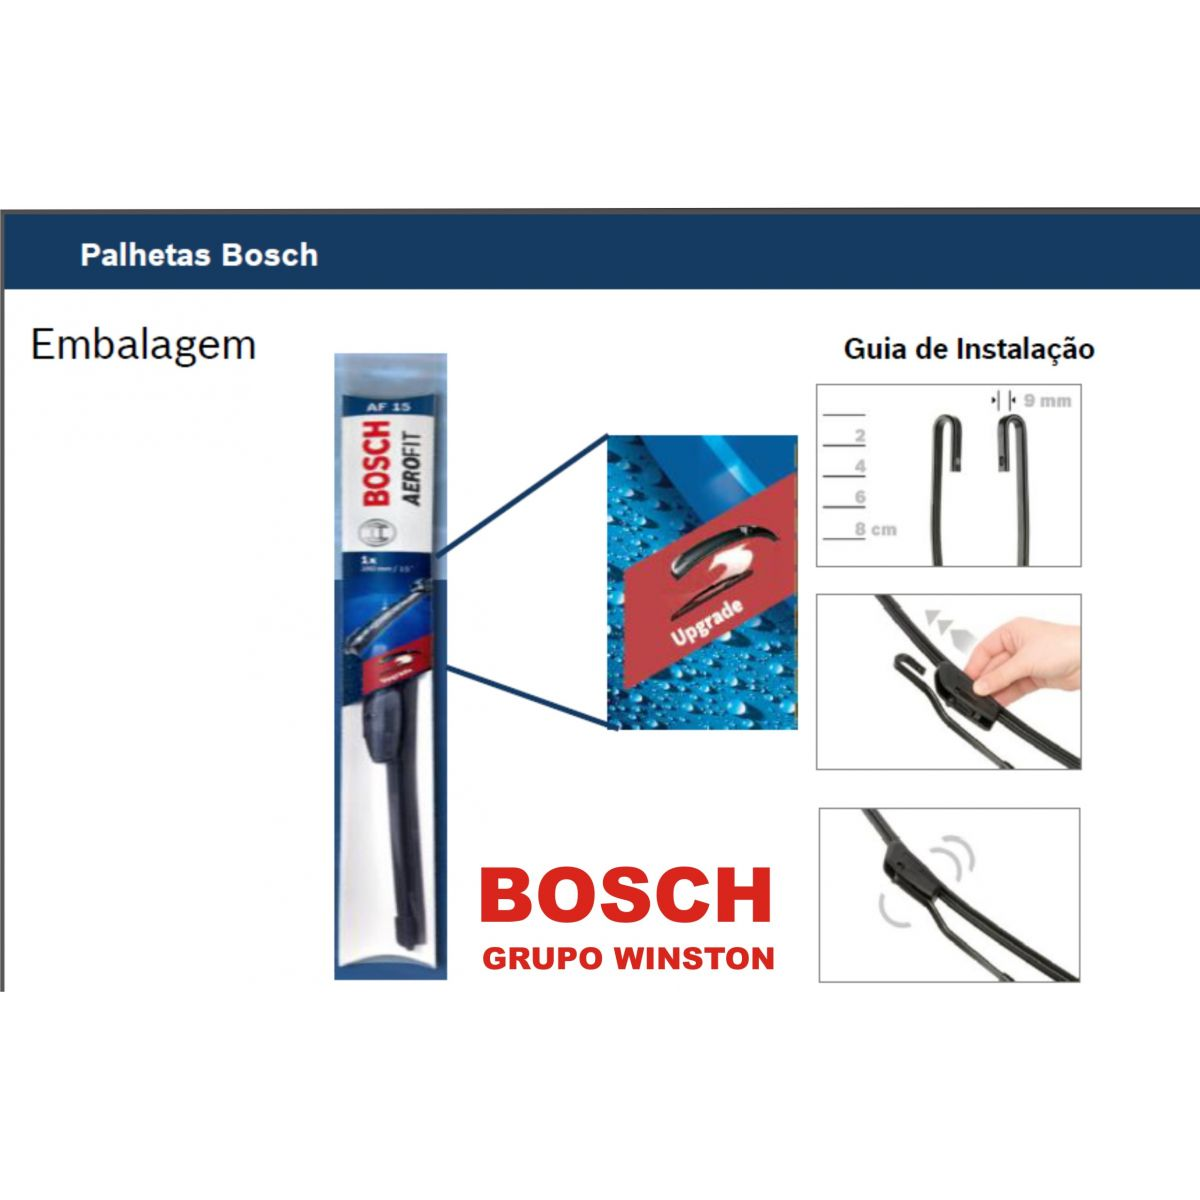 Palheta Bosch Aerofit Limpador de para brisa Bosch Hyundai Accent Atos Prime Elantra HR Sonata